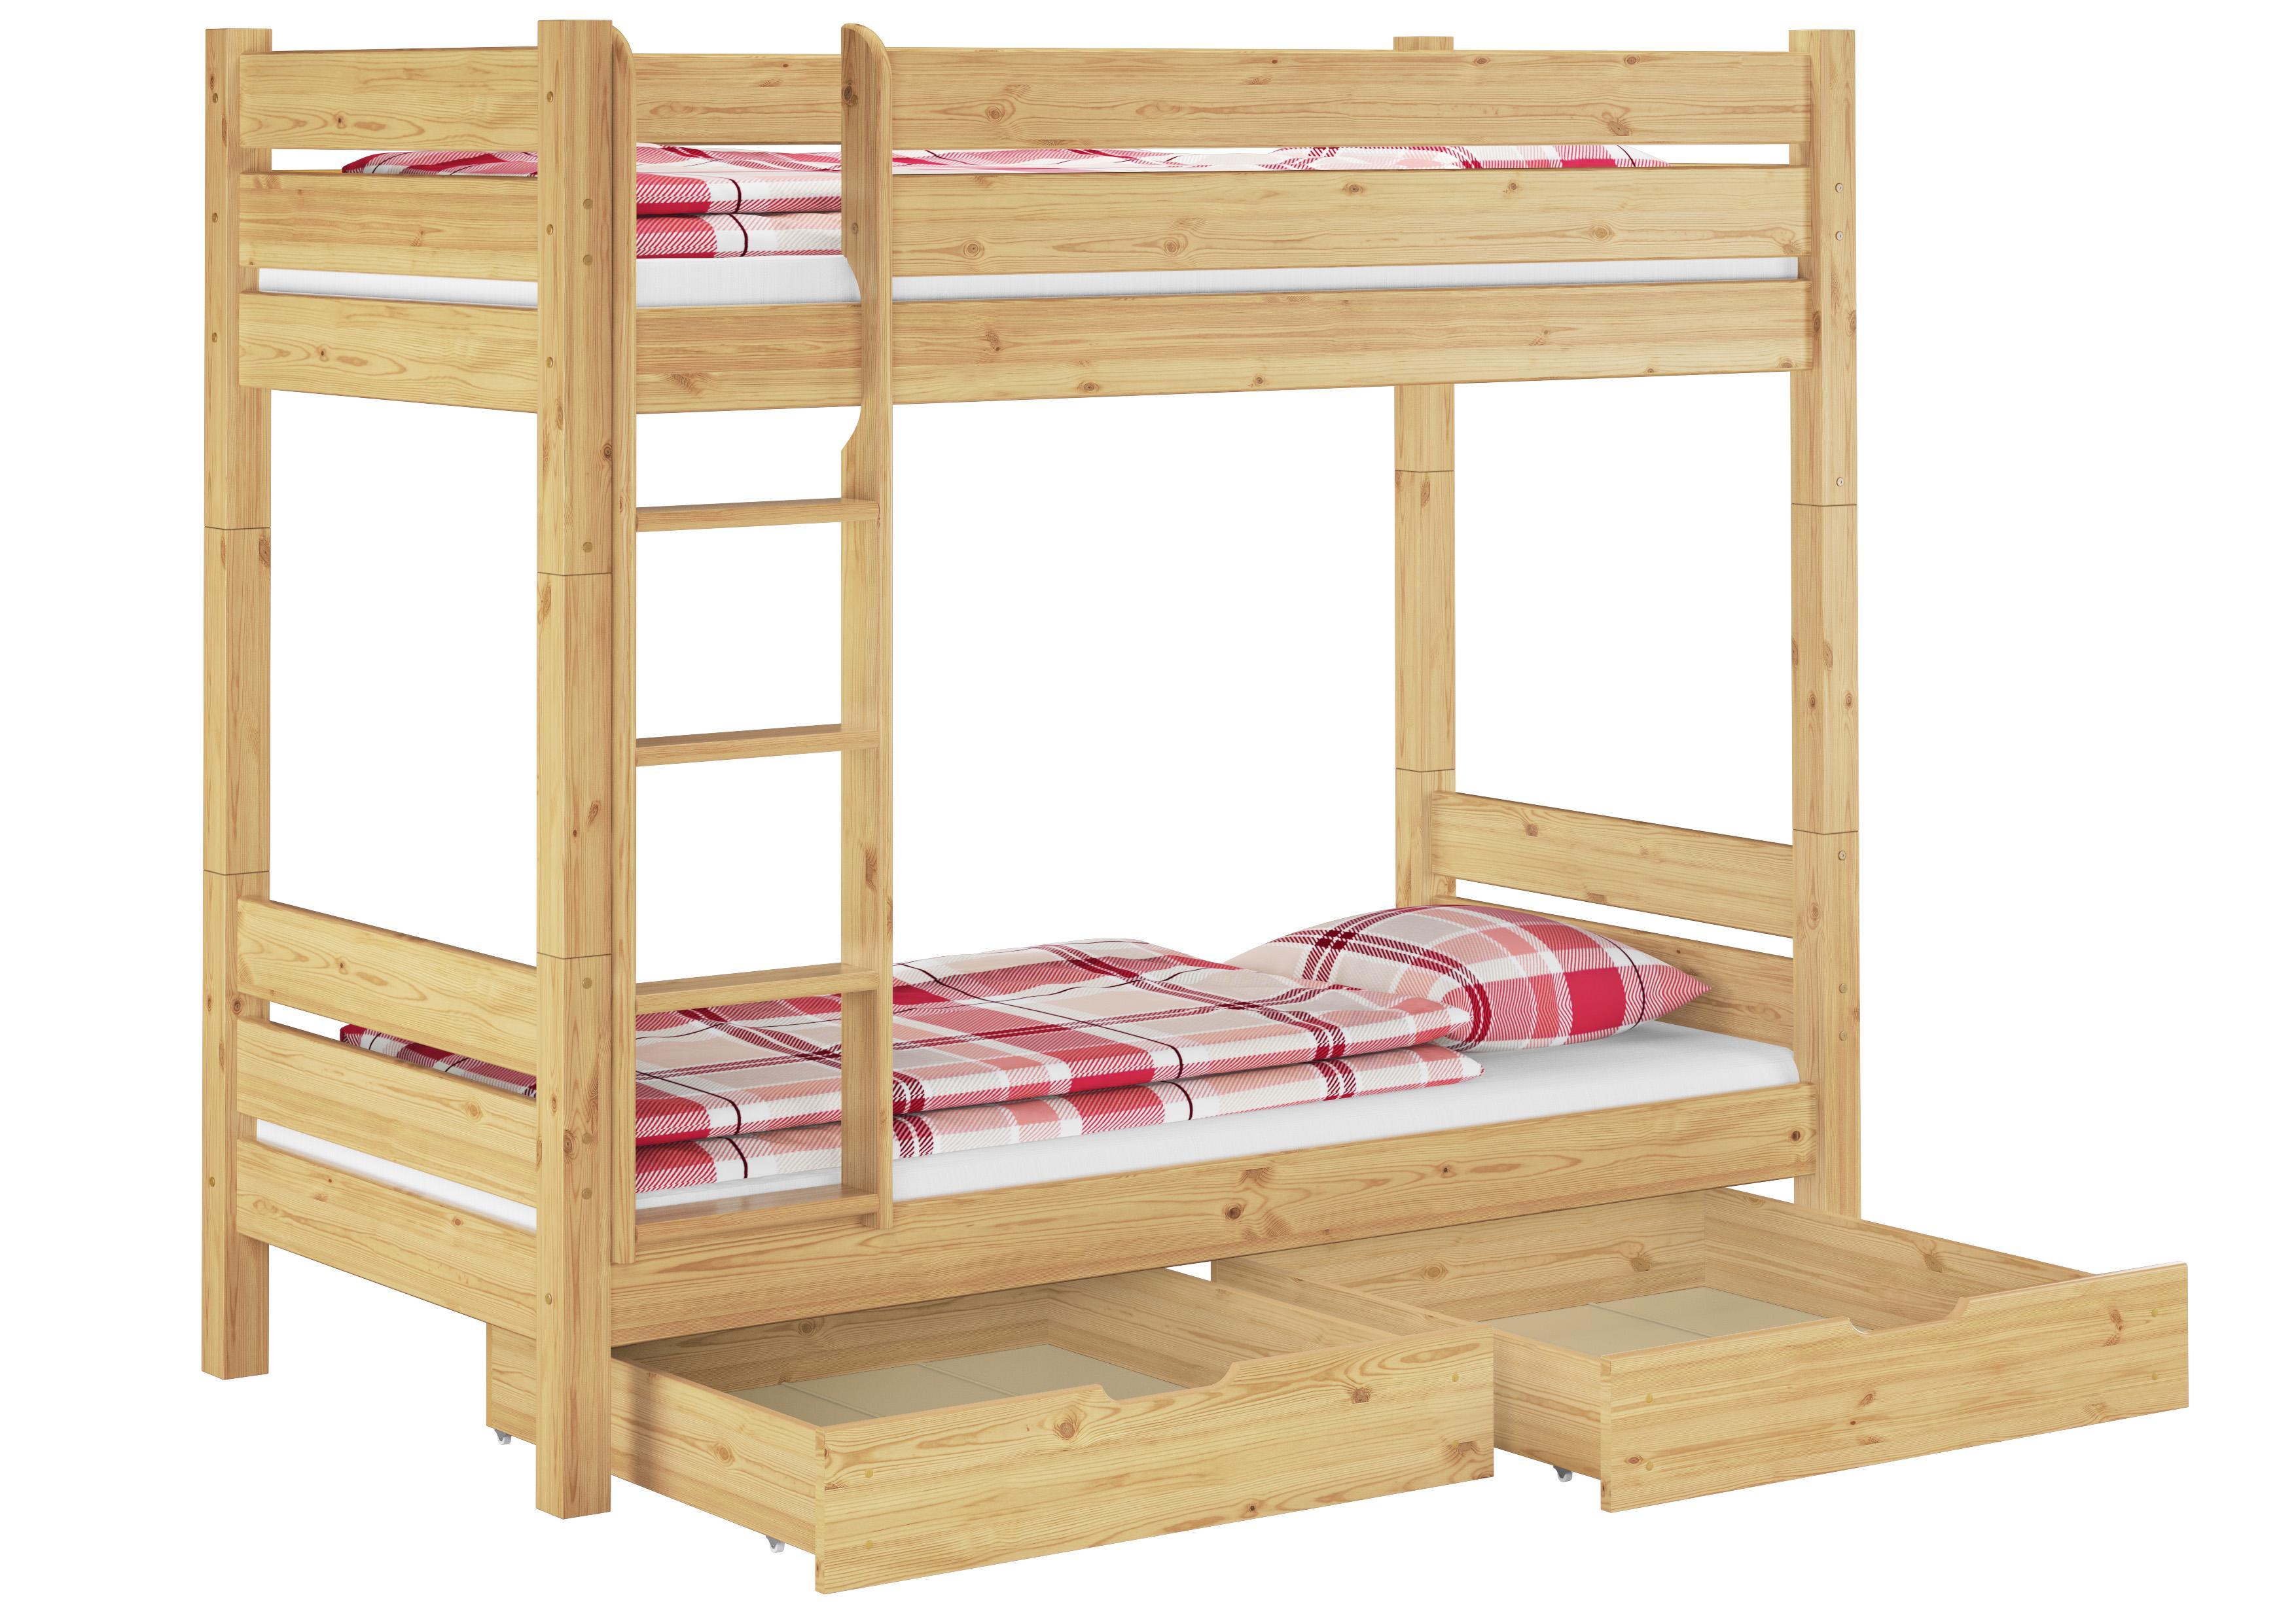 erst holz etagenbett kiefer 100x200 teilbar mit 2. Black Bedroom Furniture Sets. Home Design Ideas